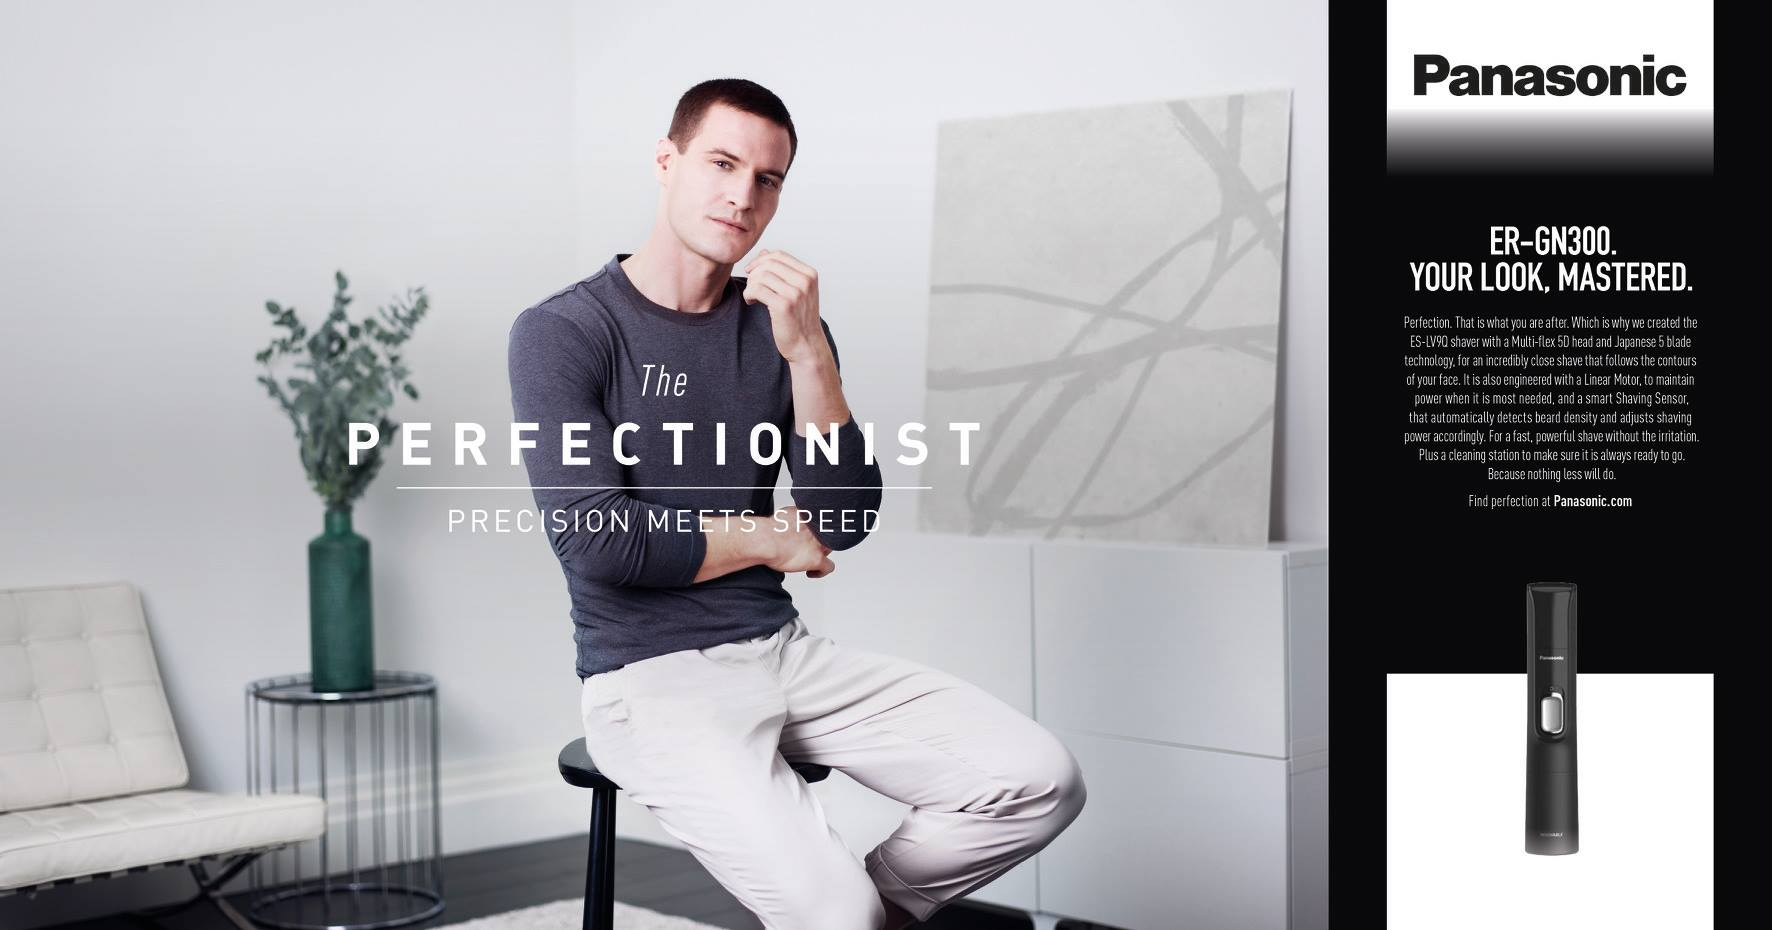 panasonic-campaign-perfectionist.jpg